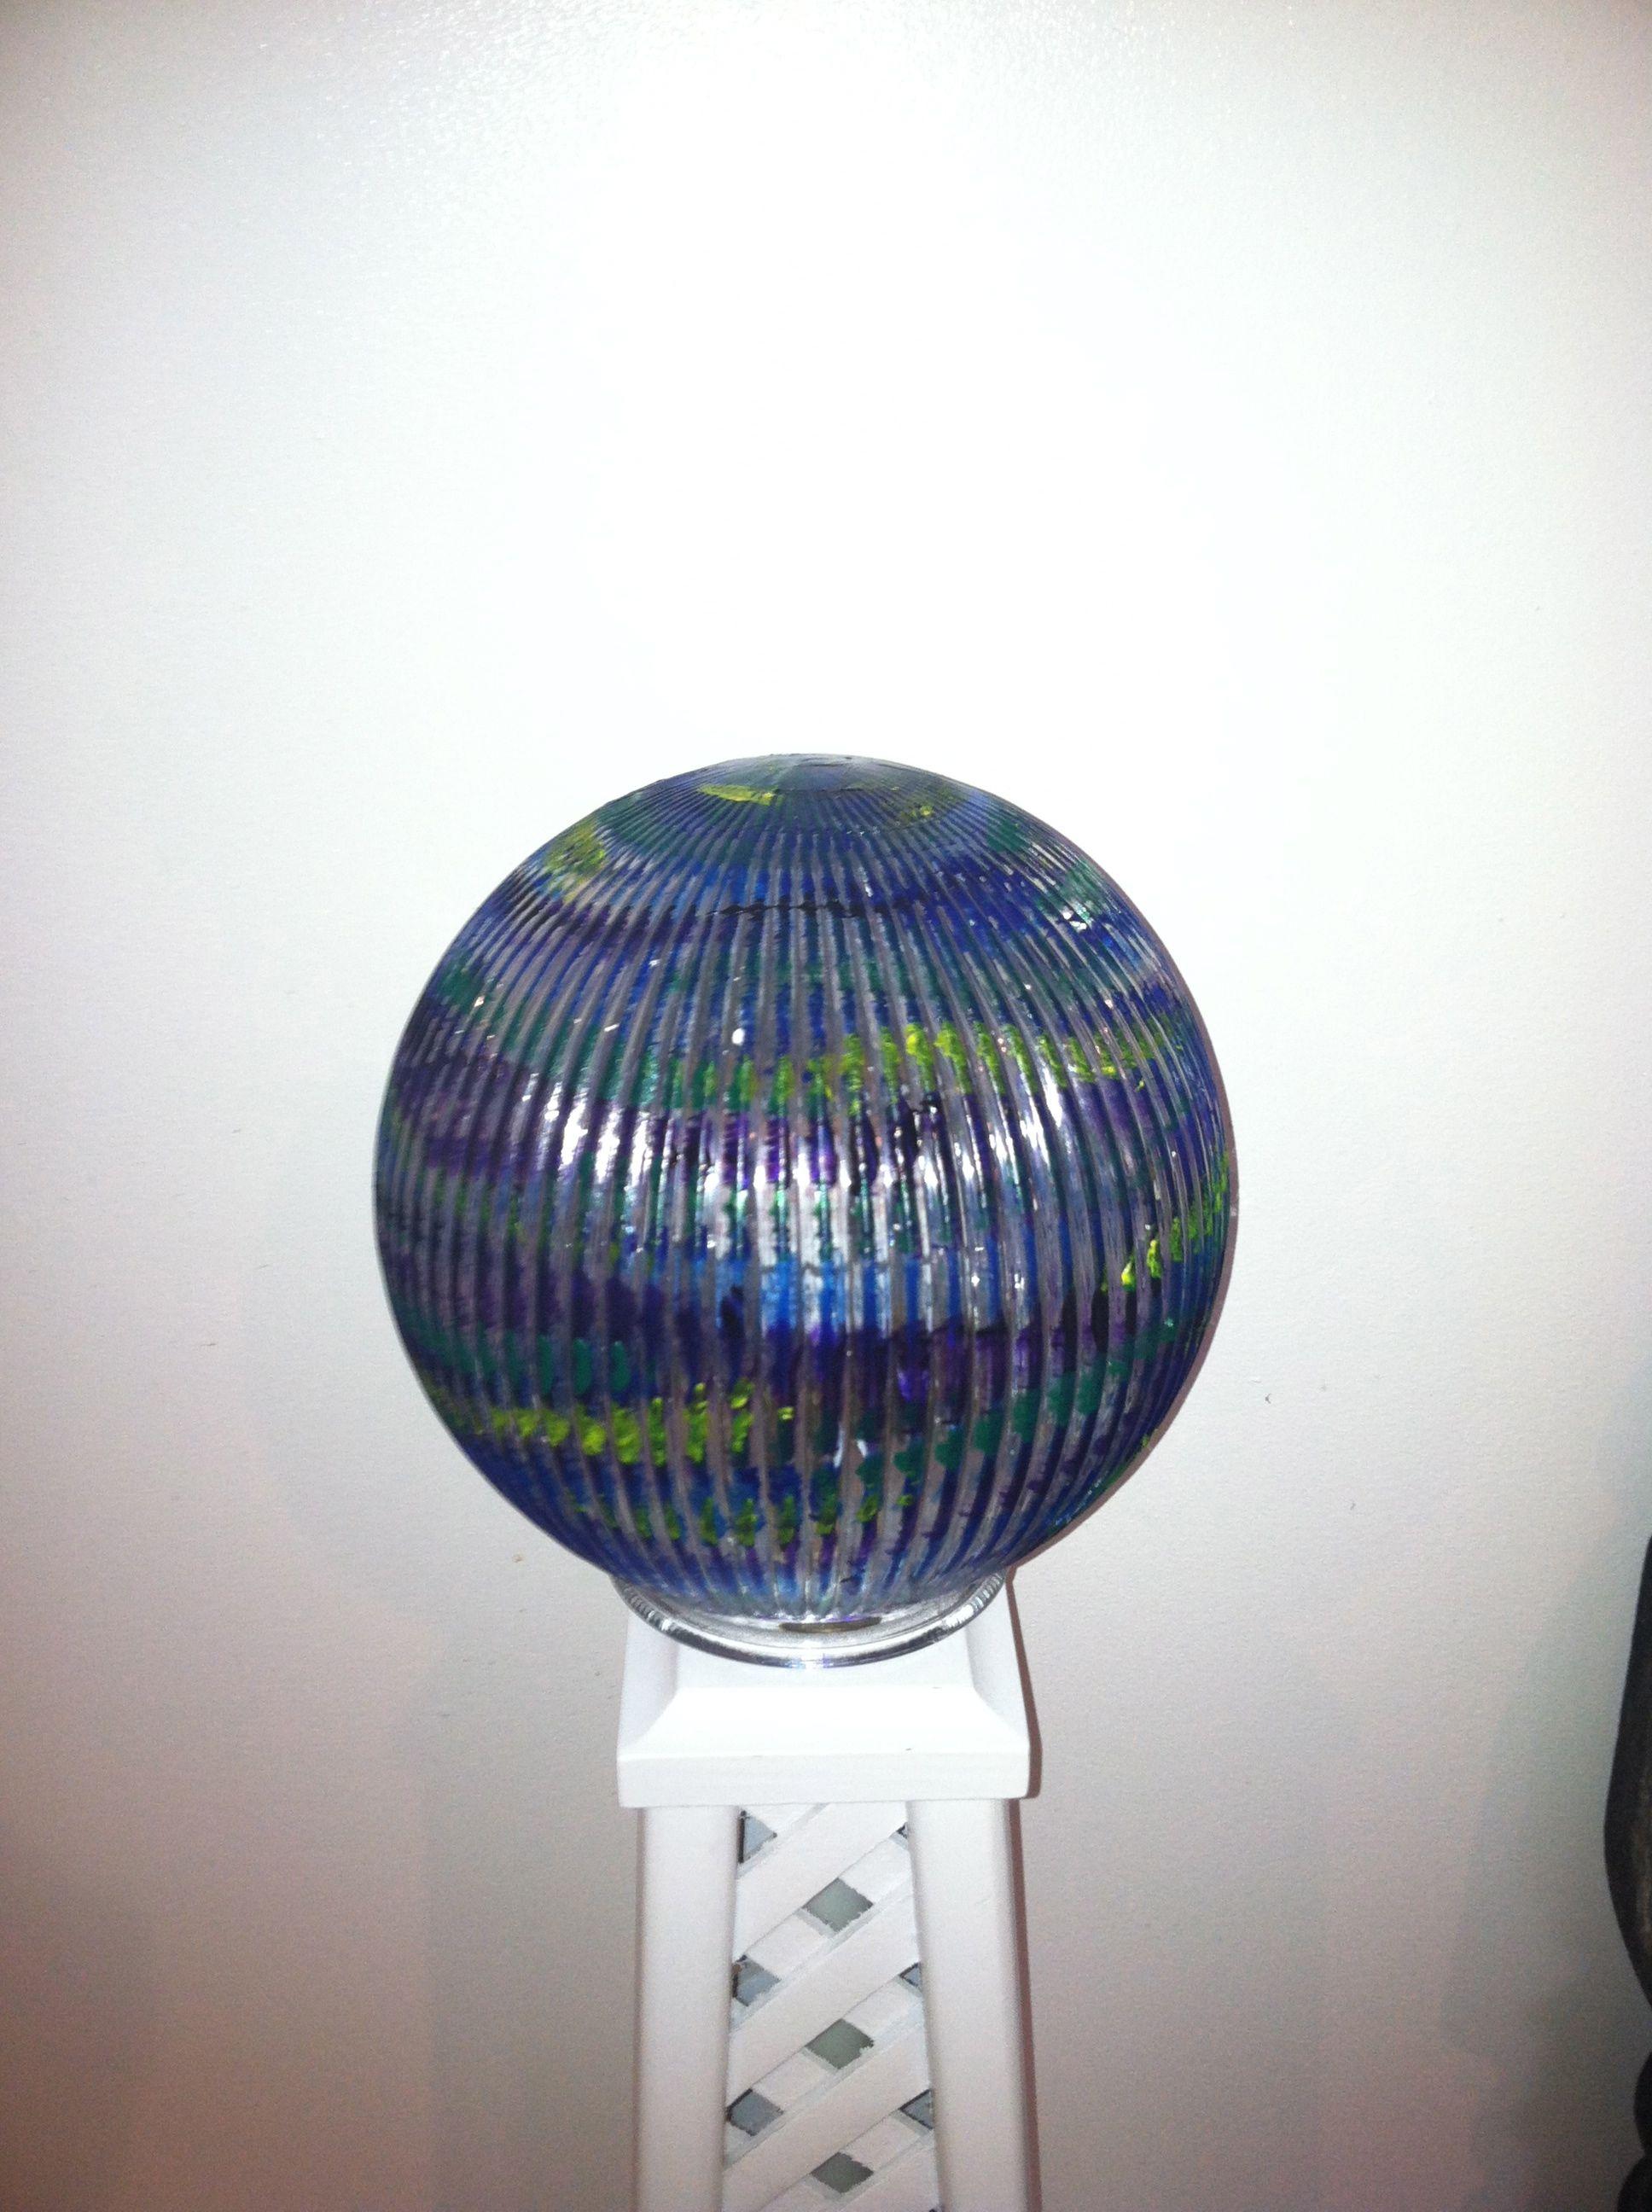 Glass orb light fixture I painted